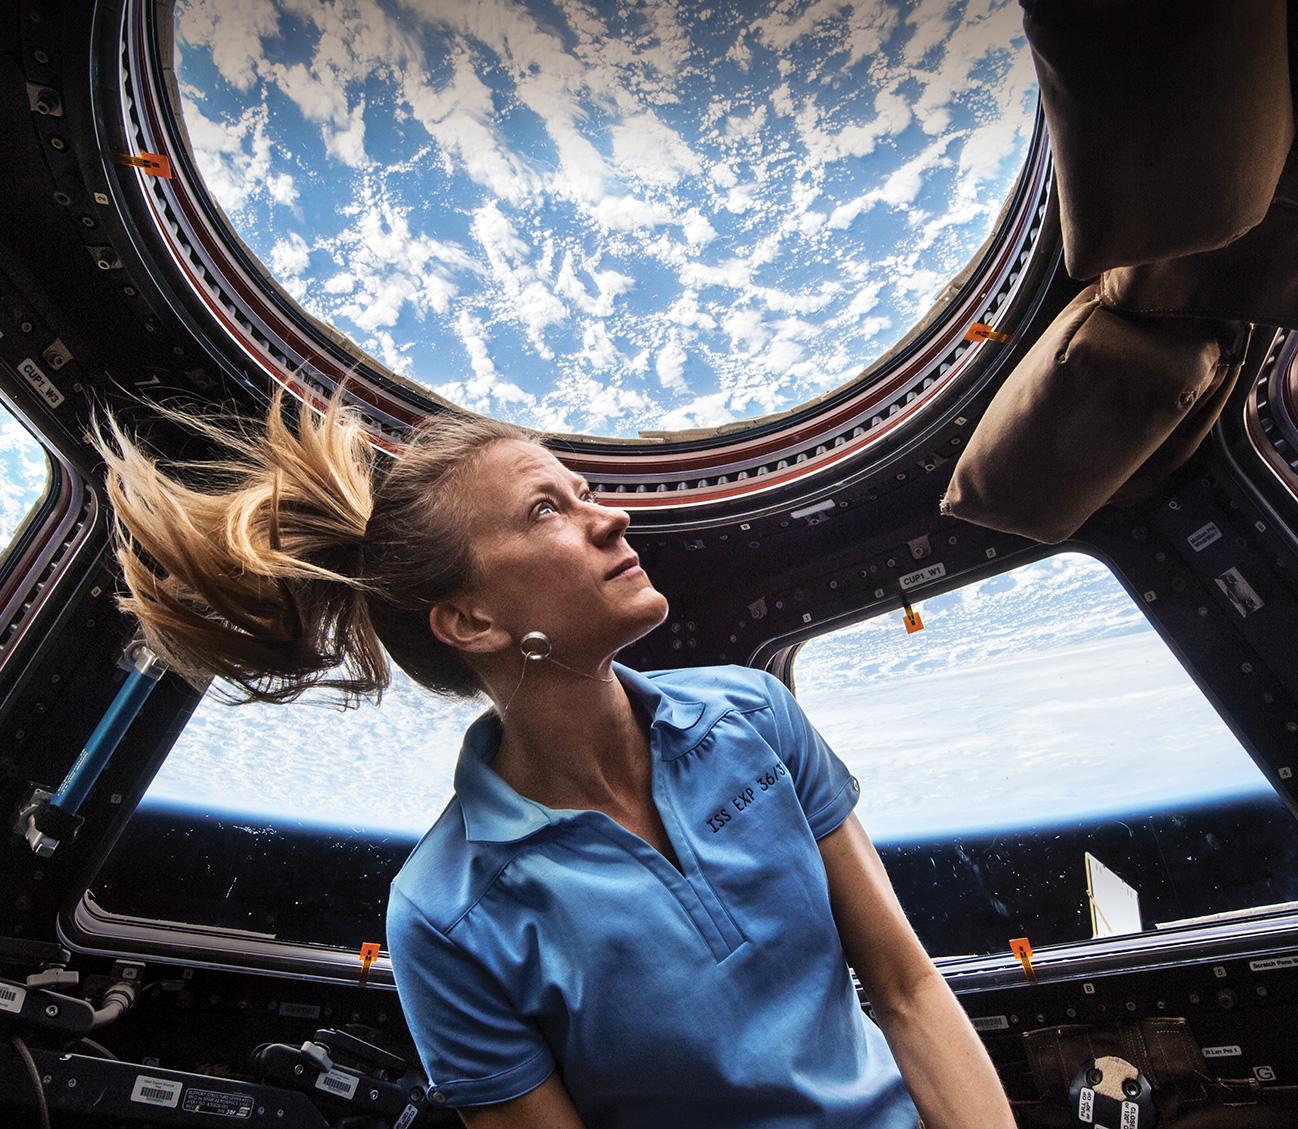 chris nyberg astronaut - photo #15